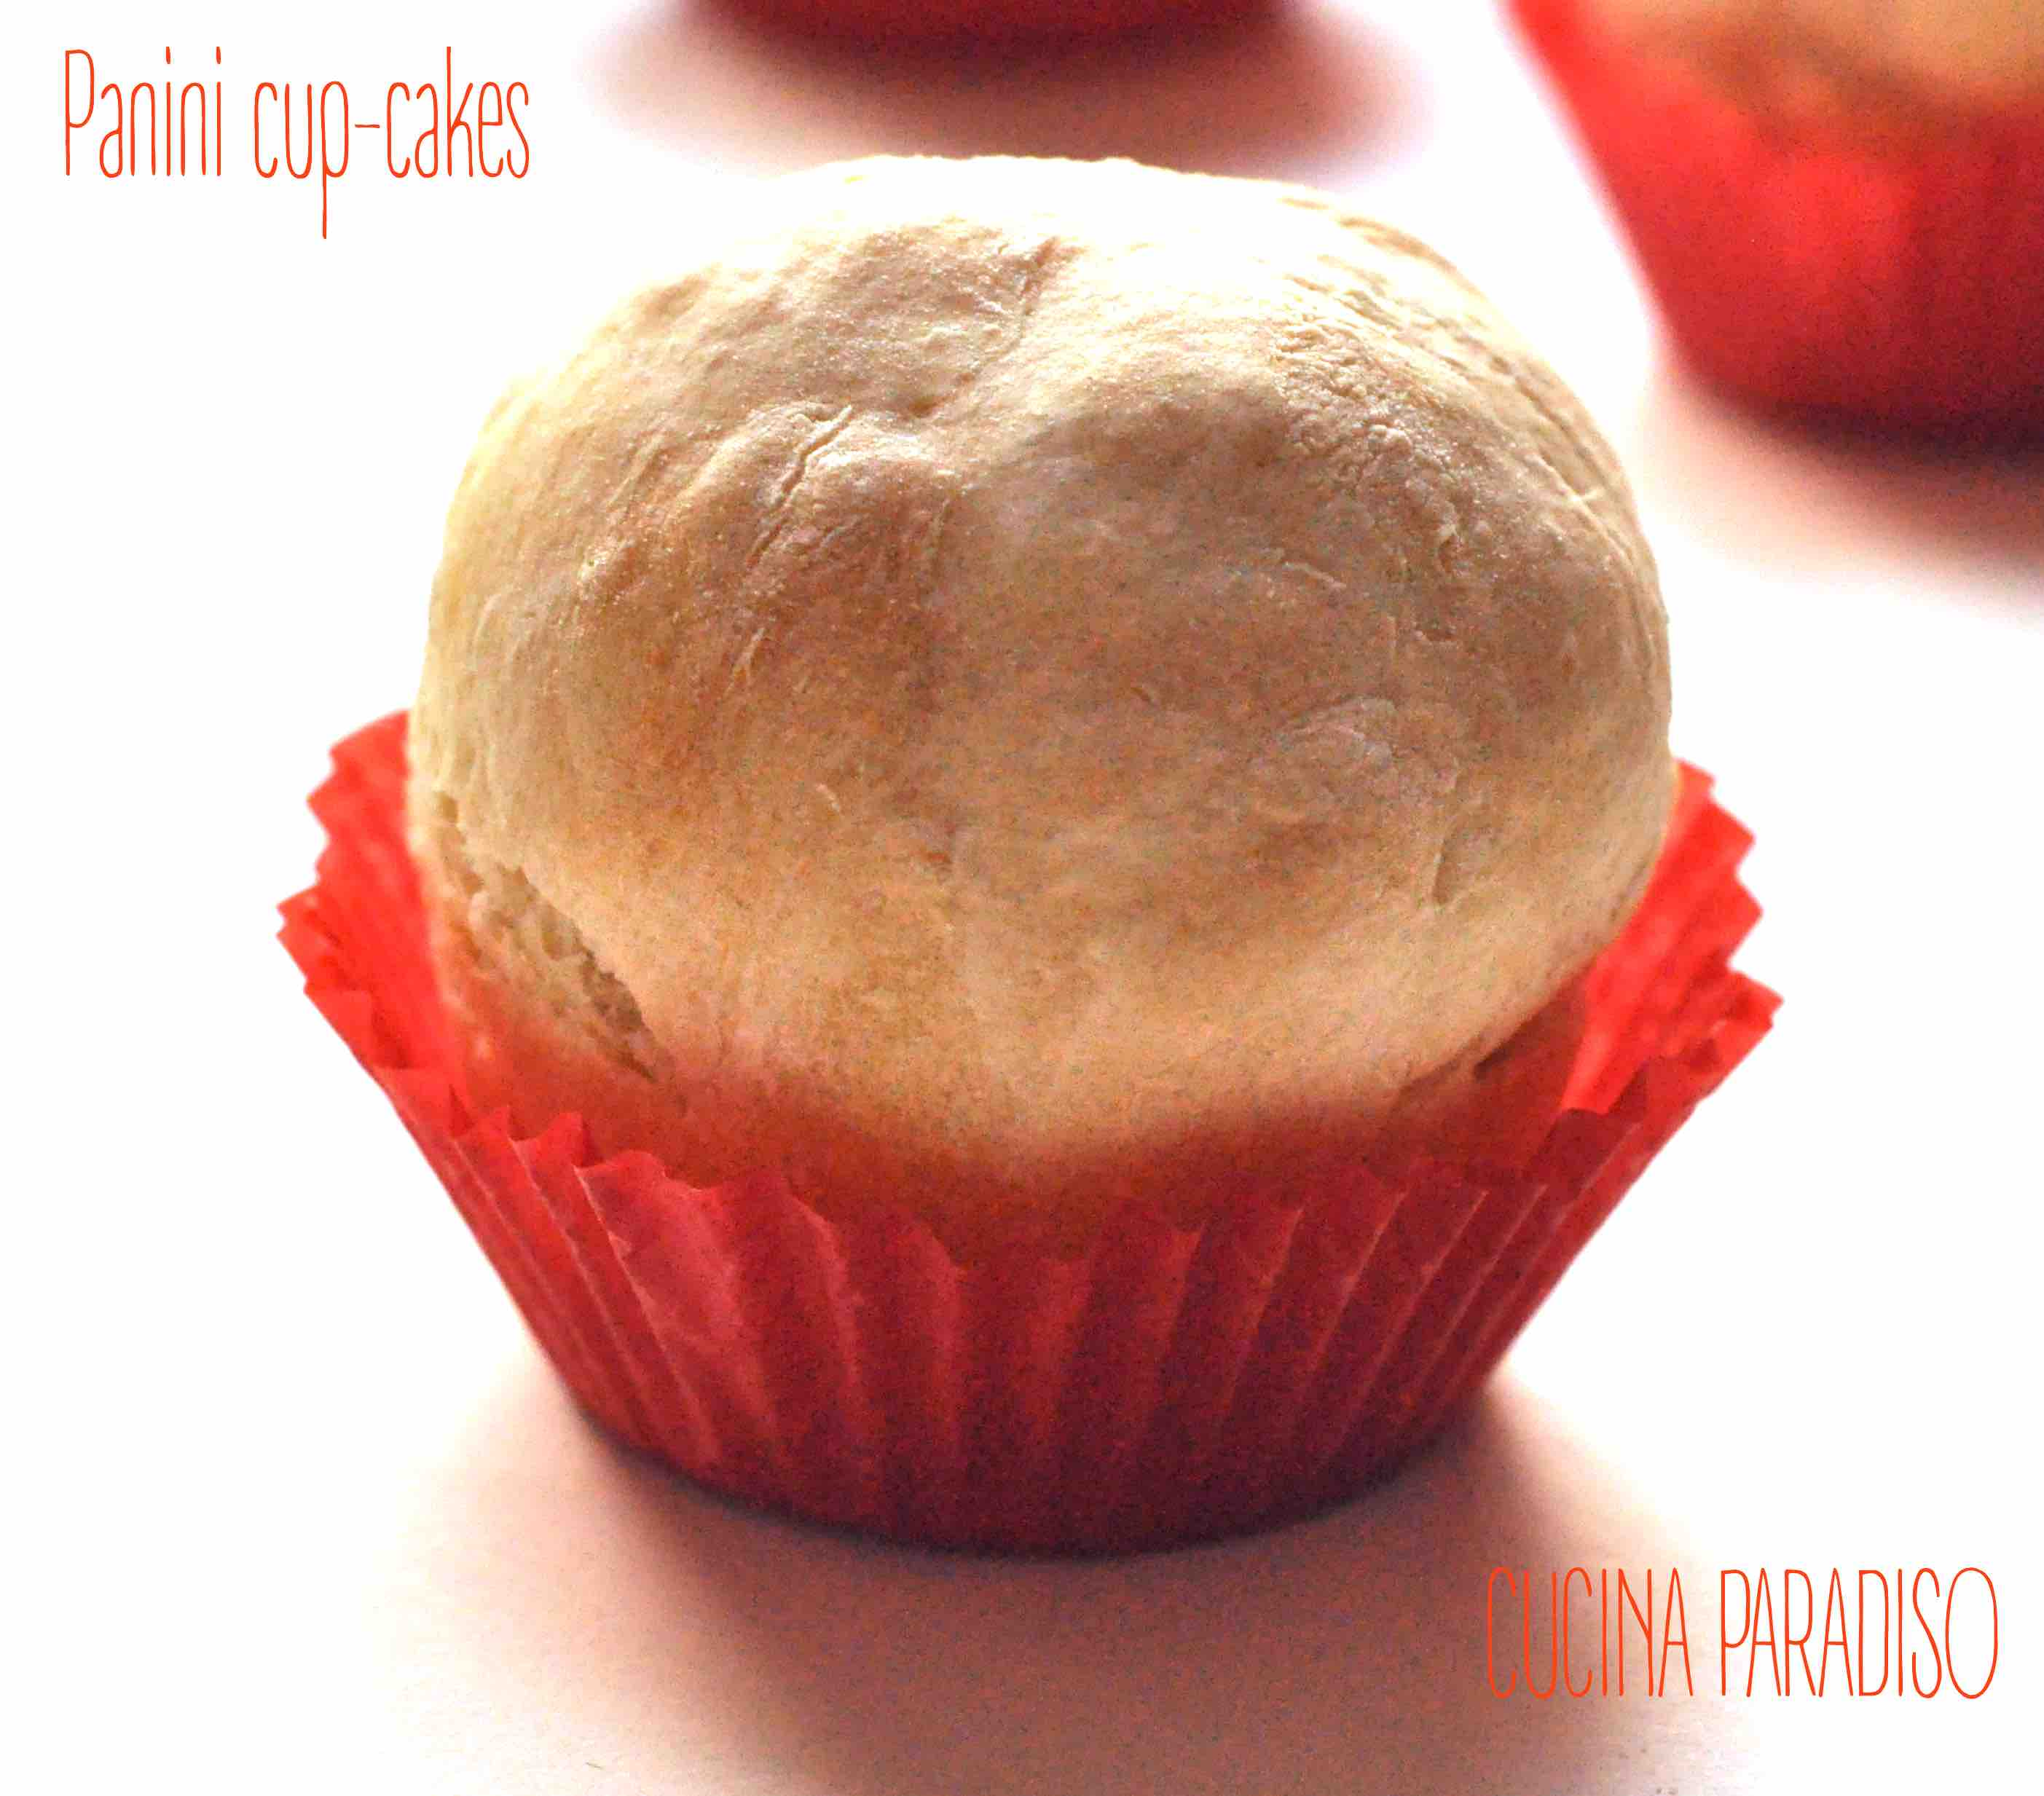 Panini cup-cakes3